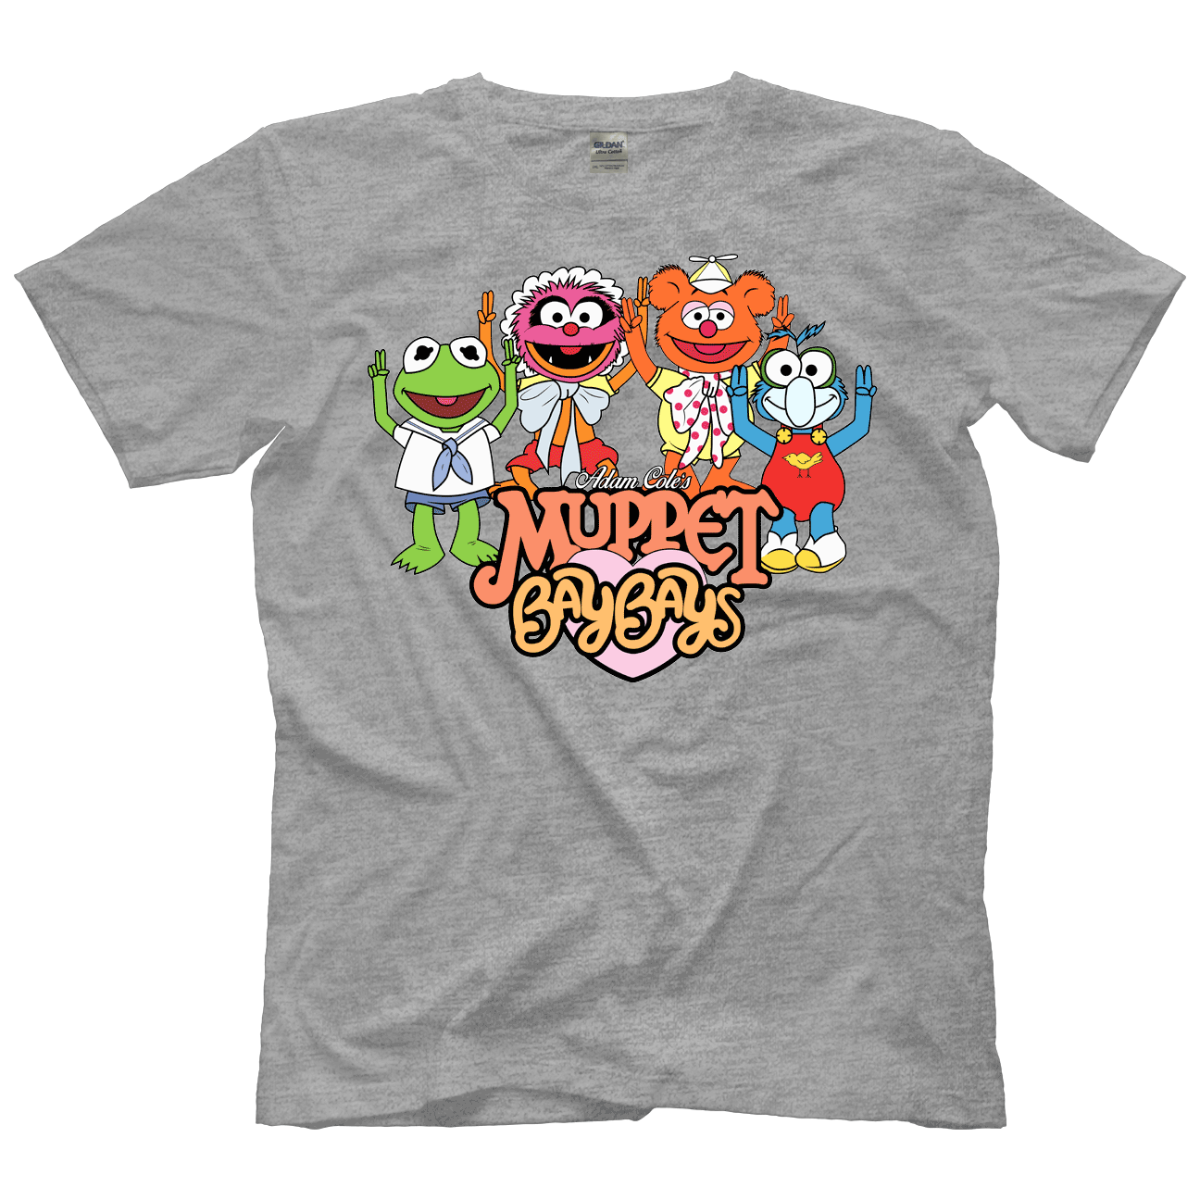 Adam Cole BayBays T-shirt